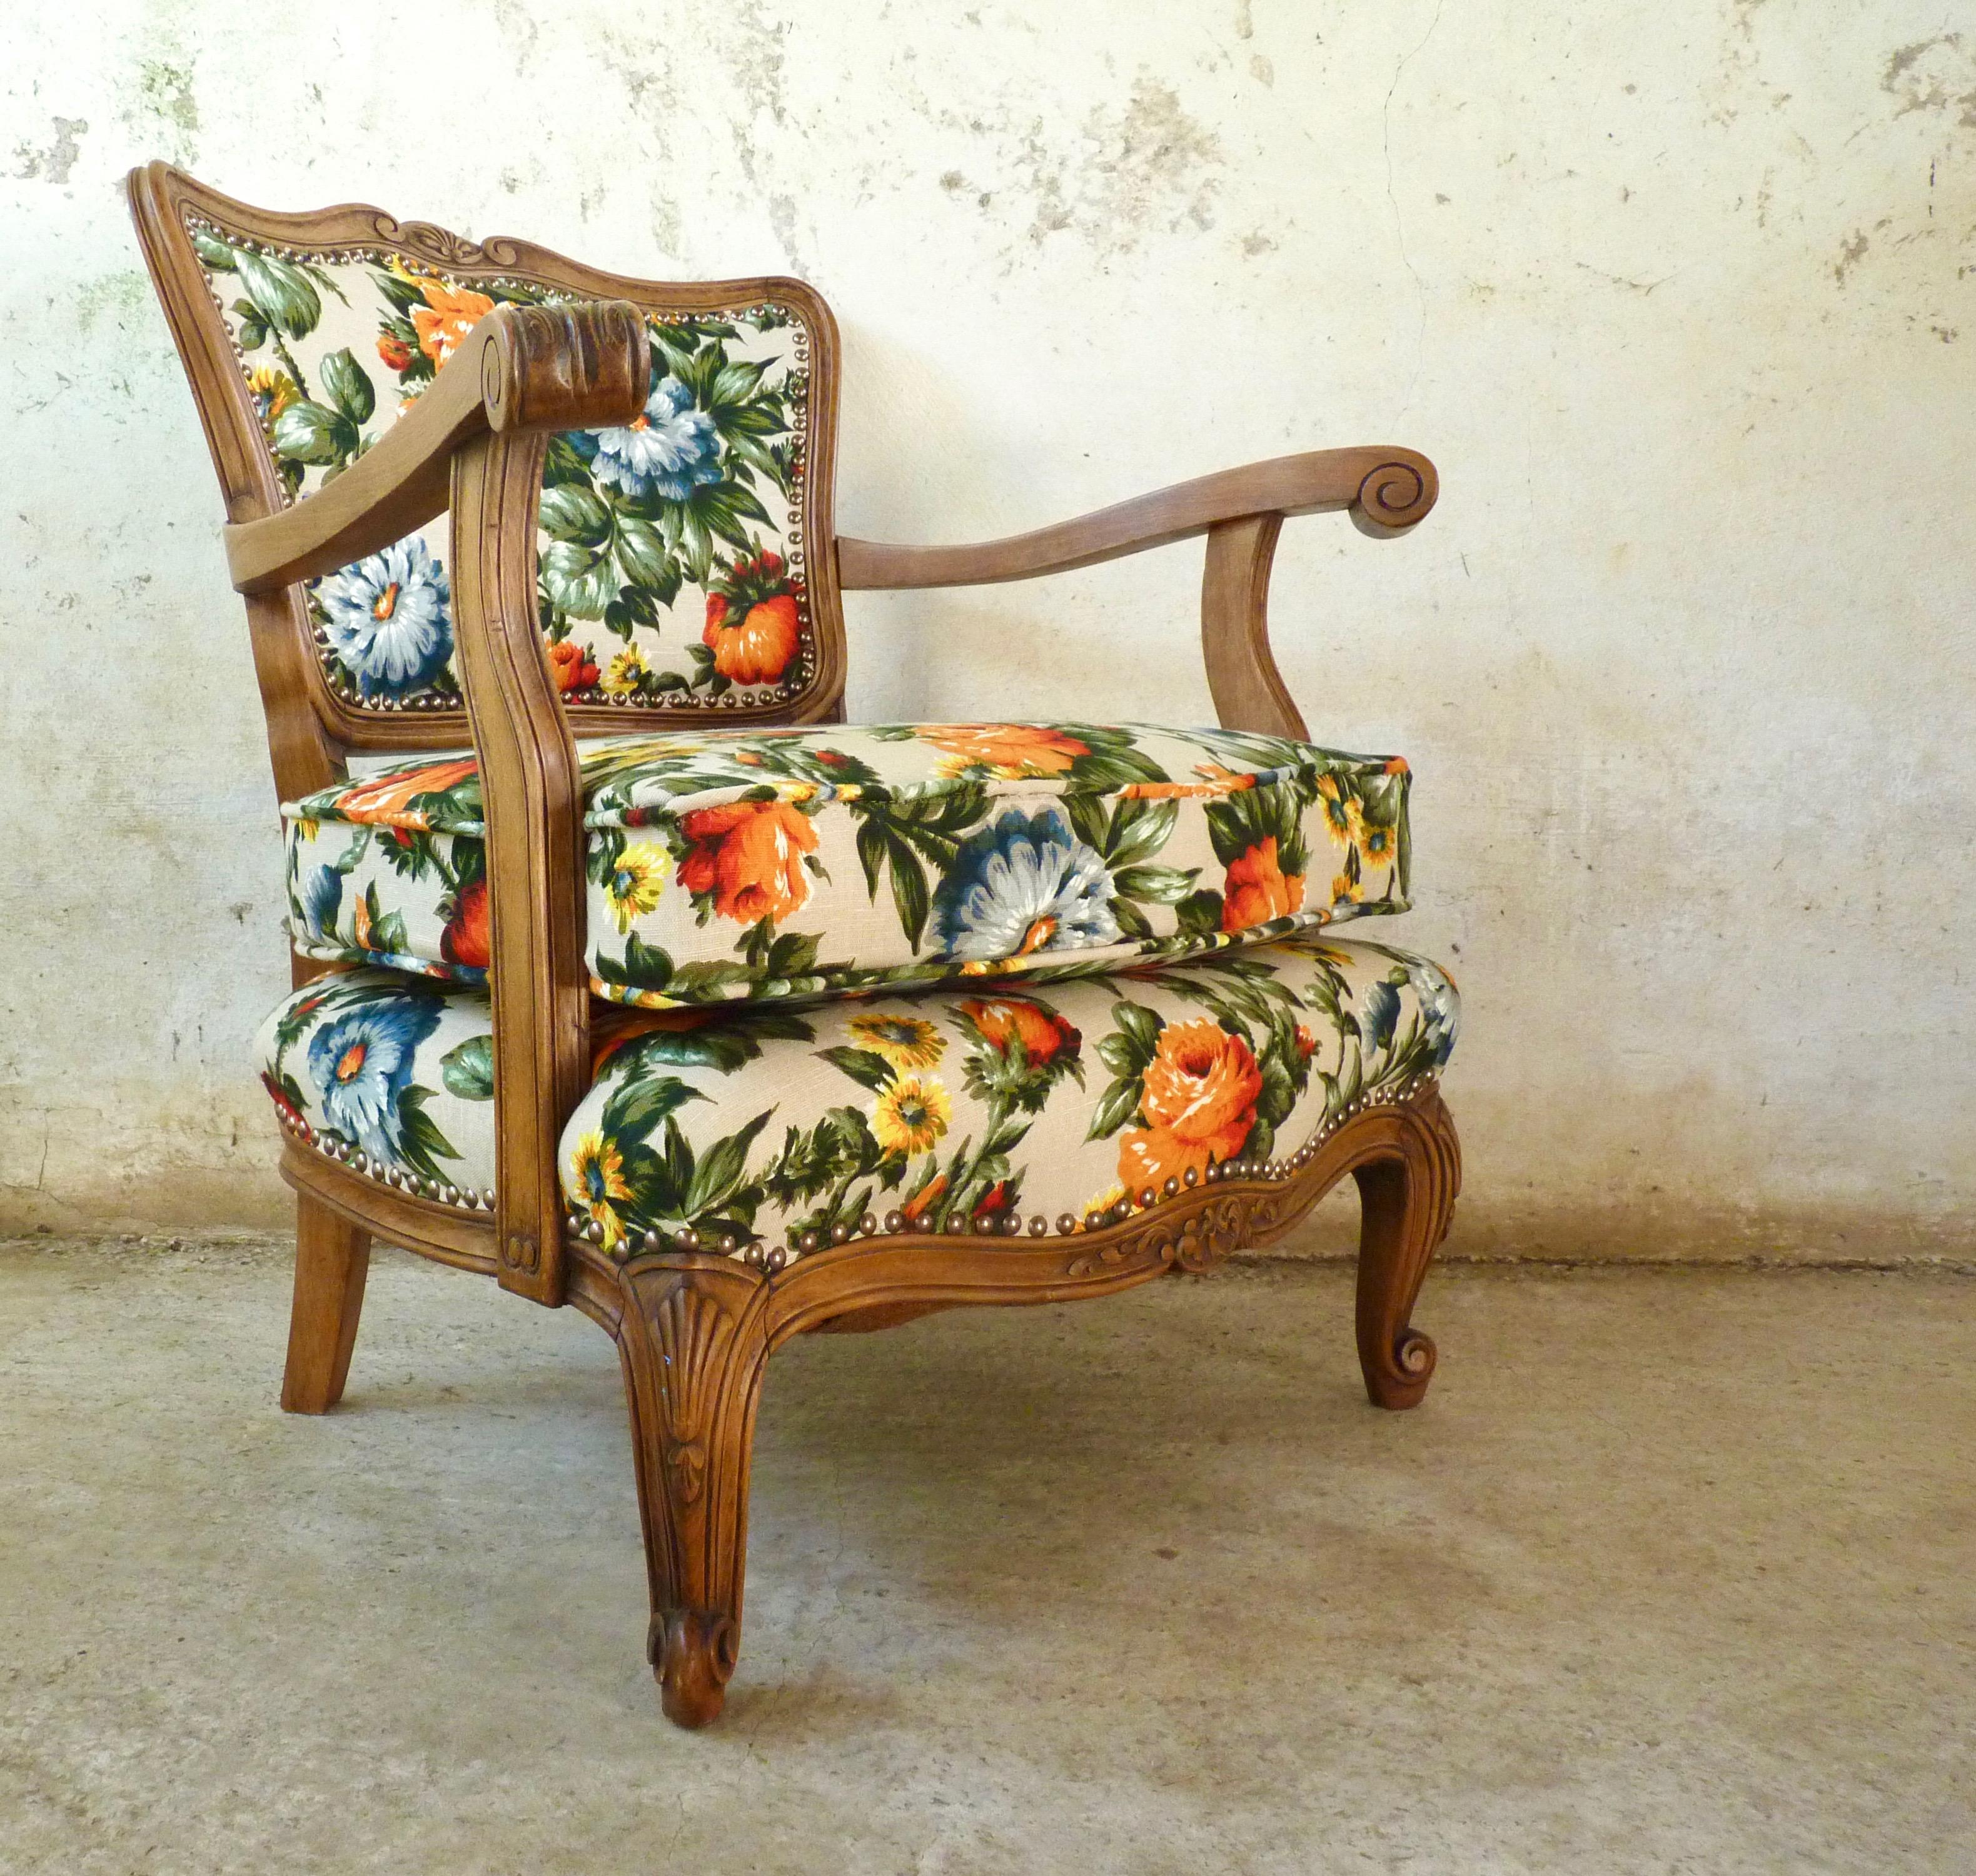 Vibrant decorative French salon chair